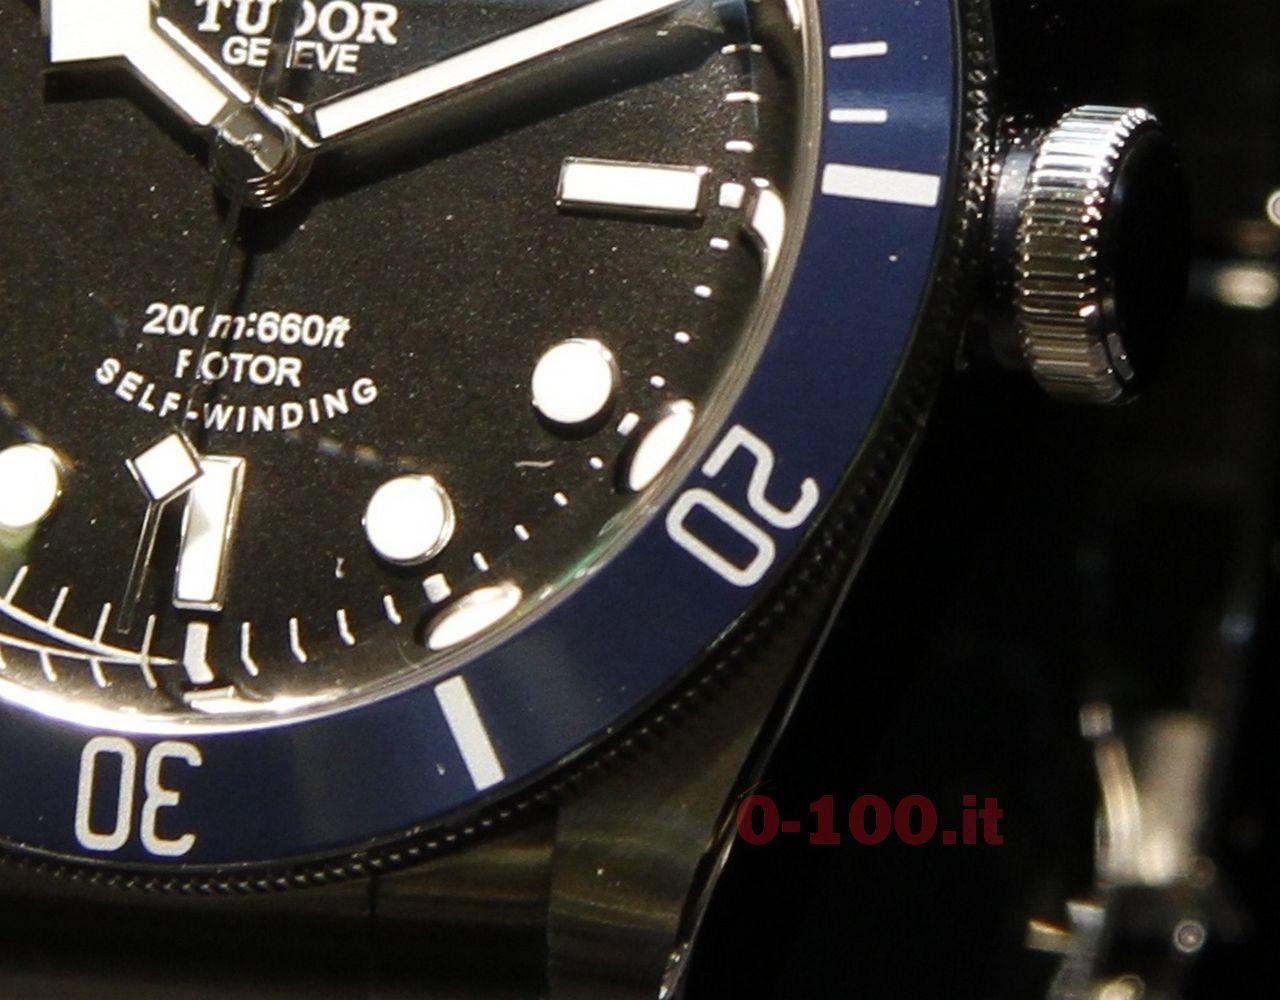 Baselworld2014_Tudor Heritage Black Bay Ref. 79220B-0-1006